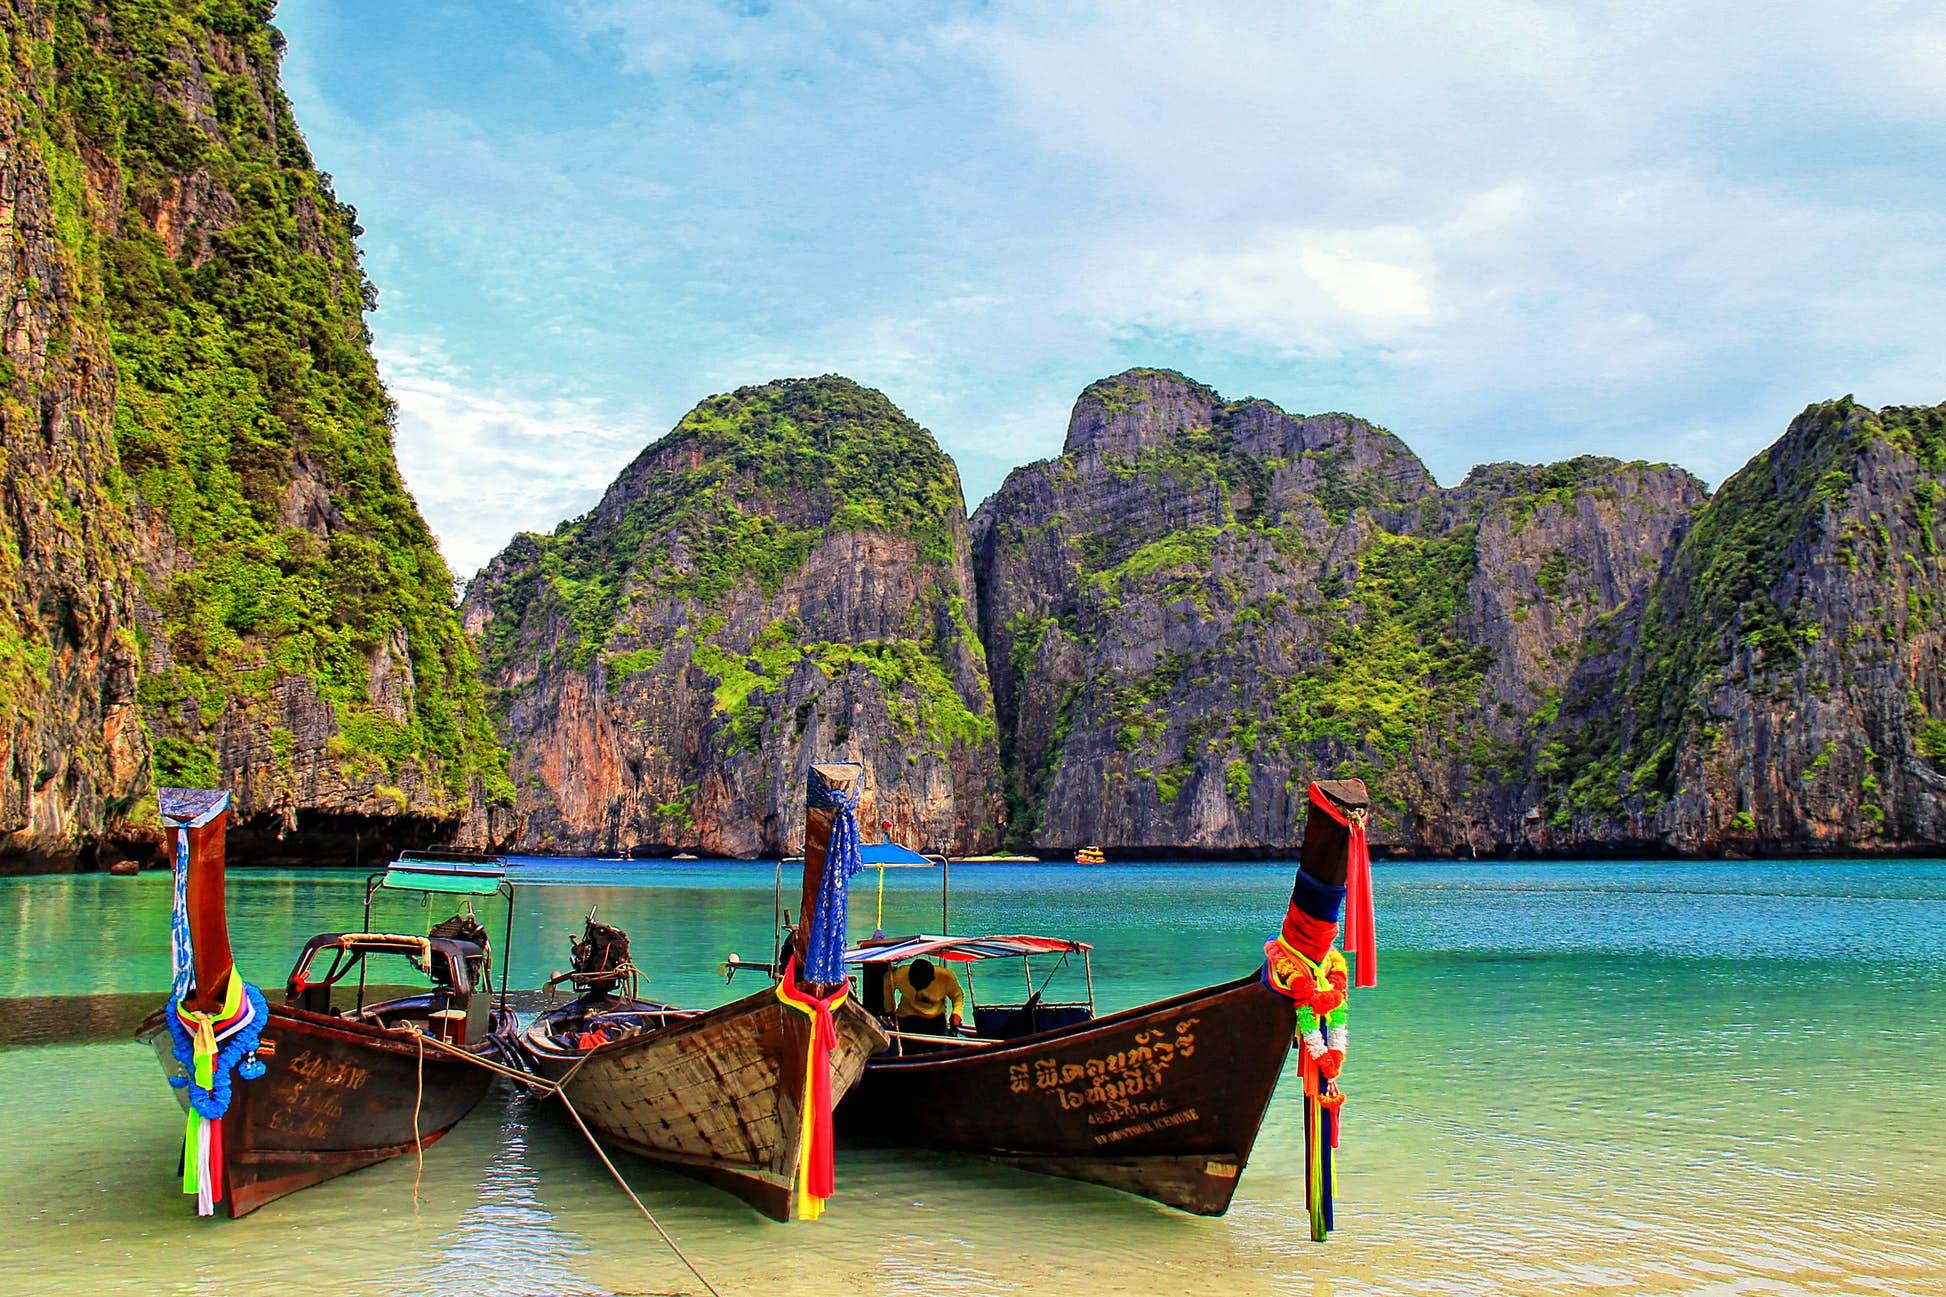 Maya Bay, Koh Phi Phi, Thailand ©Aaron Morgan/500px